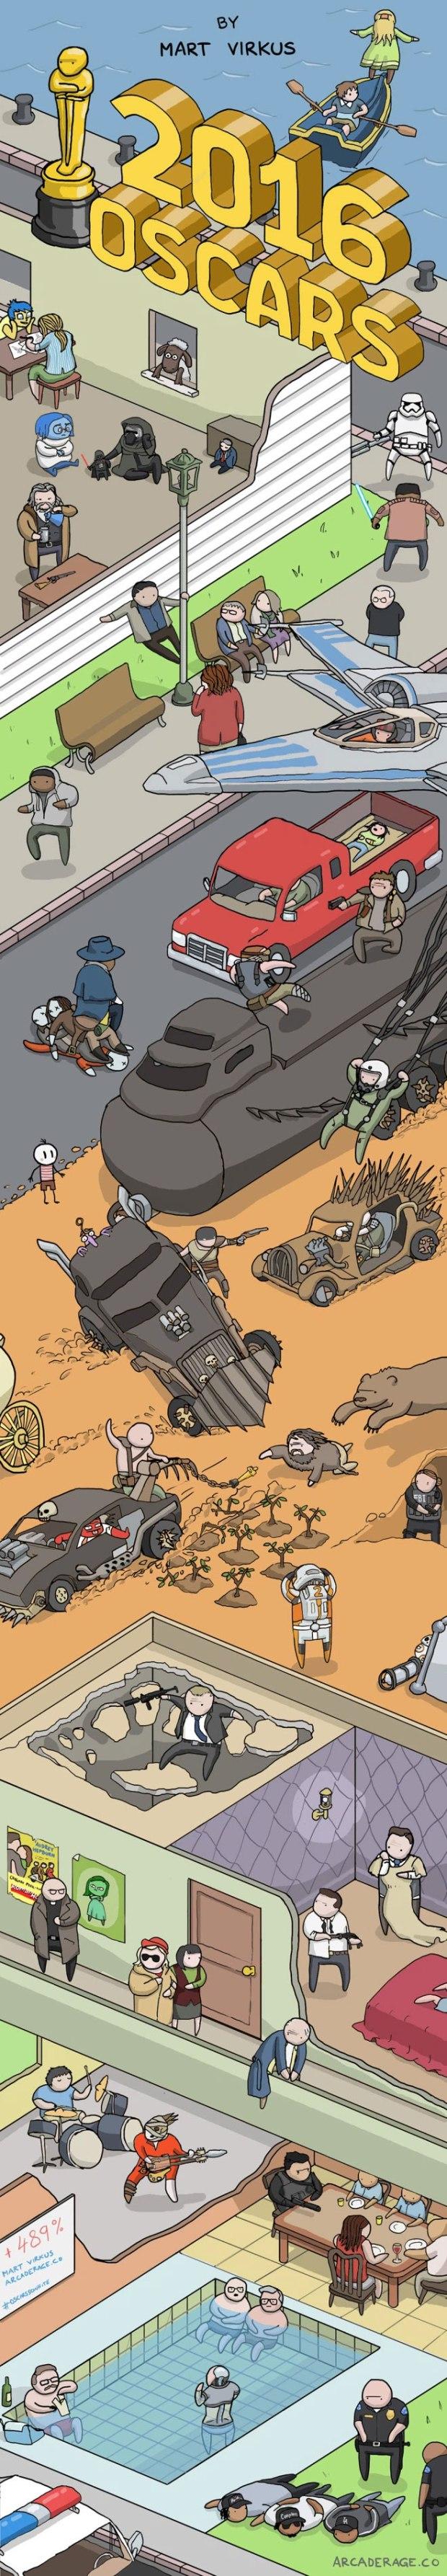 Oscars 2016 illustration Mark Virkus